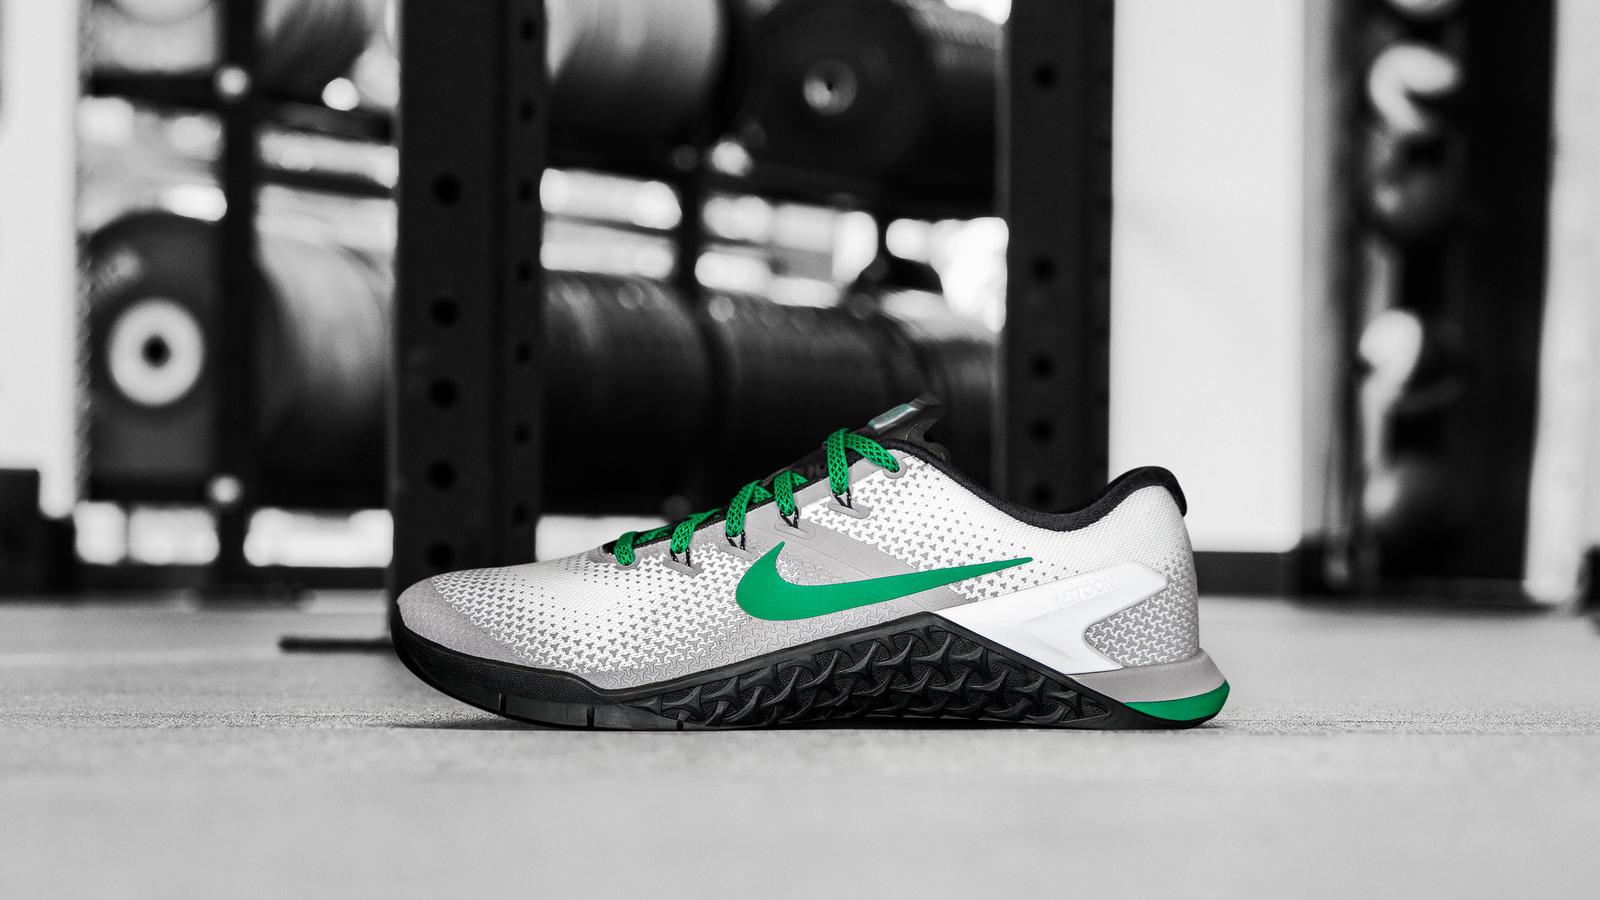 Nike Metcon 4 Invictus 1